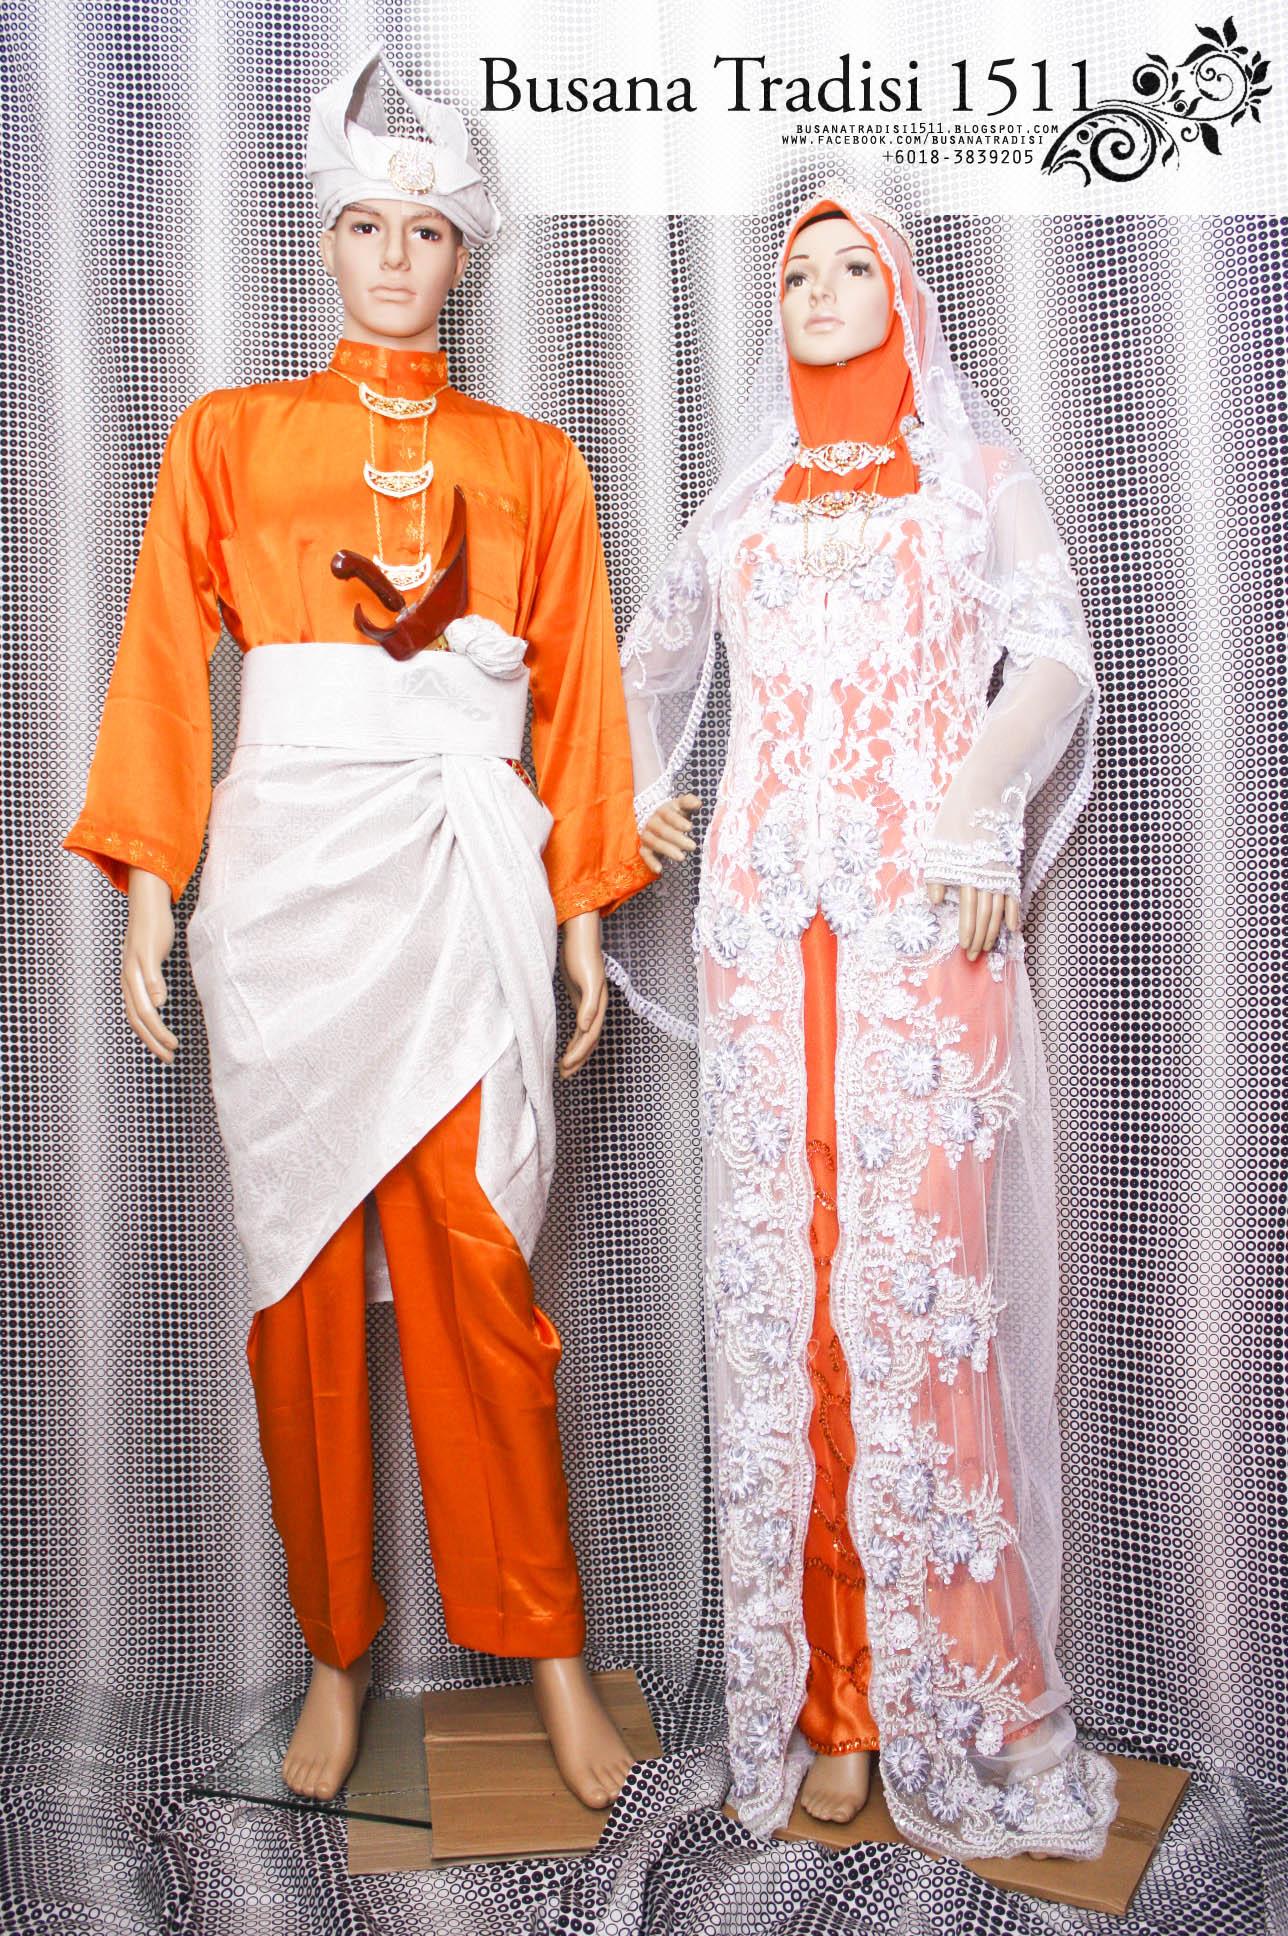 promosi sewa pakaian busana pengantin songket, lace, baju melayu